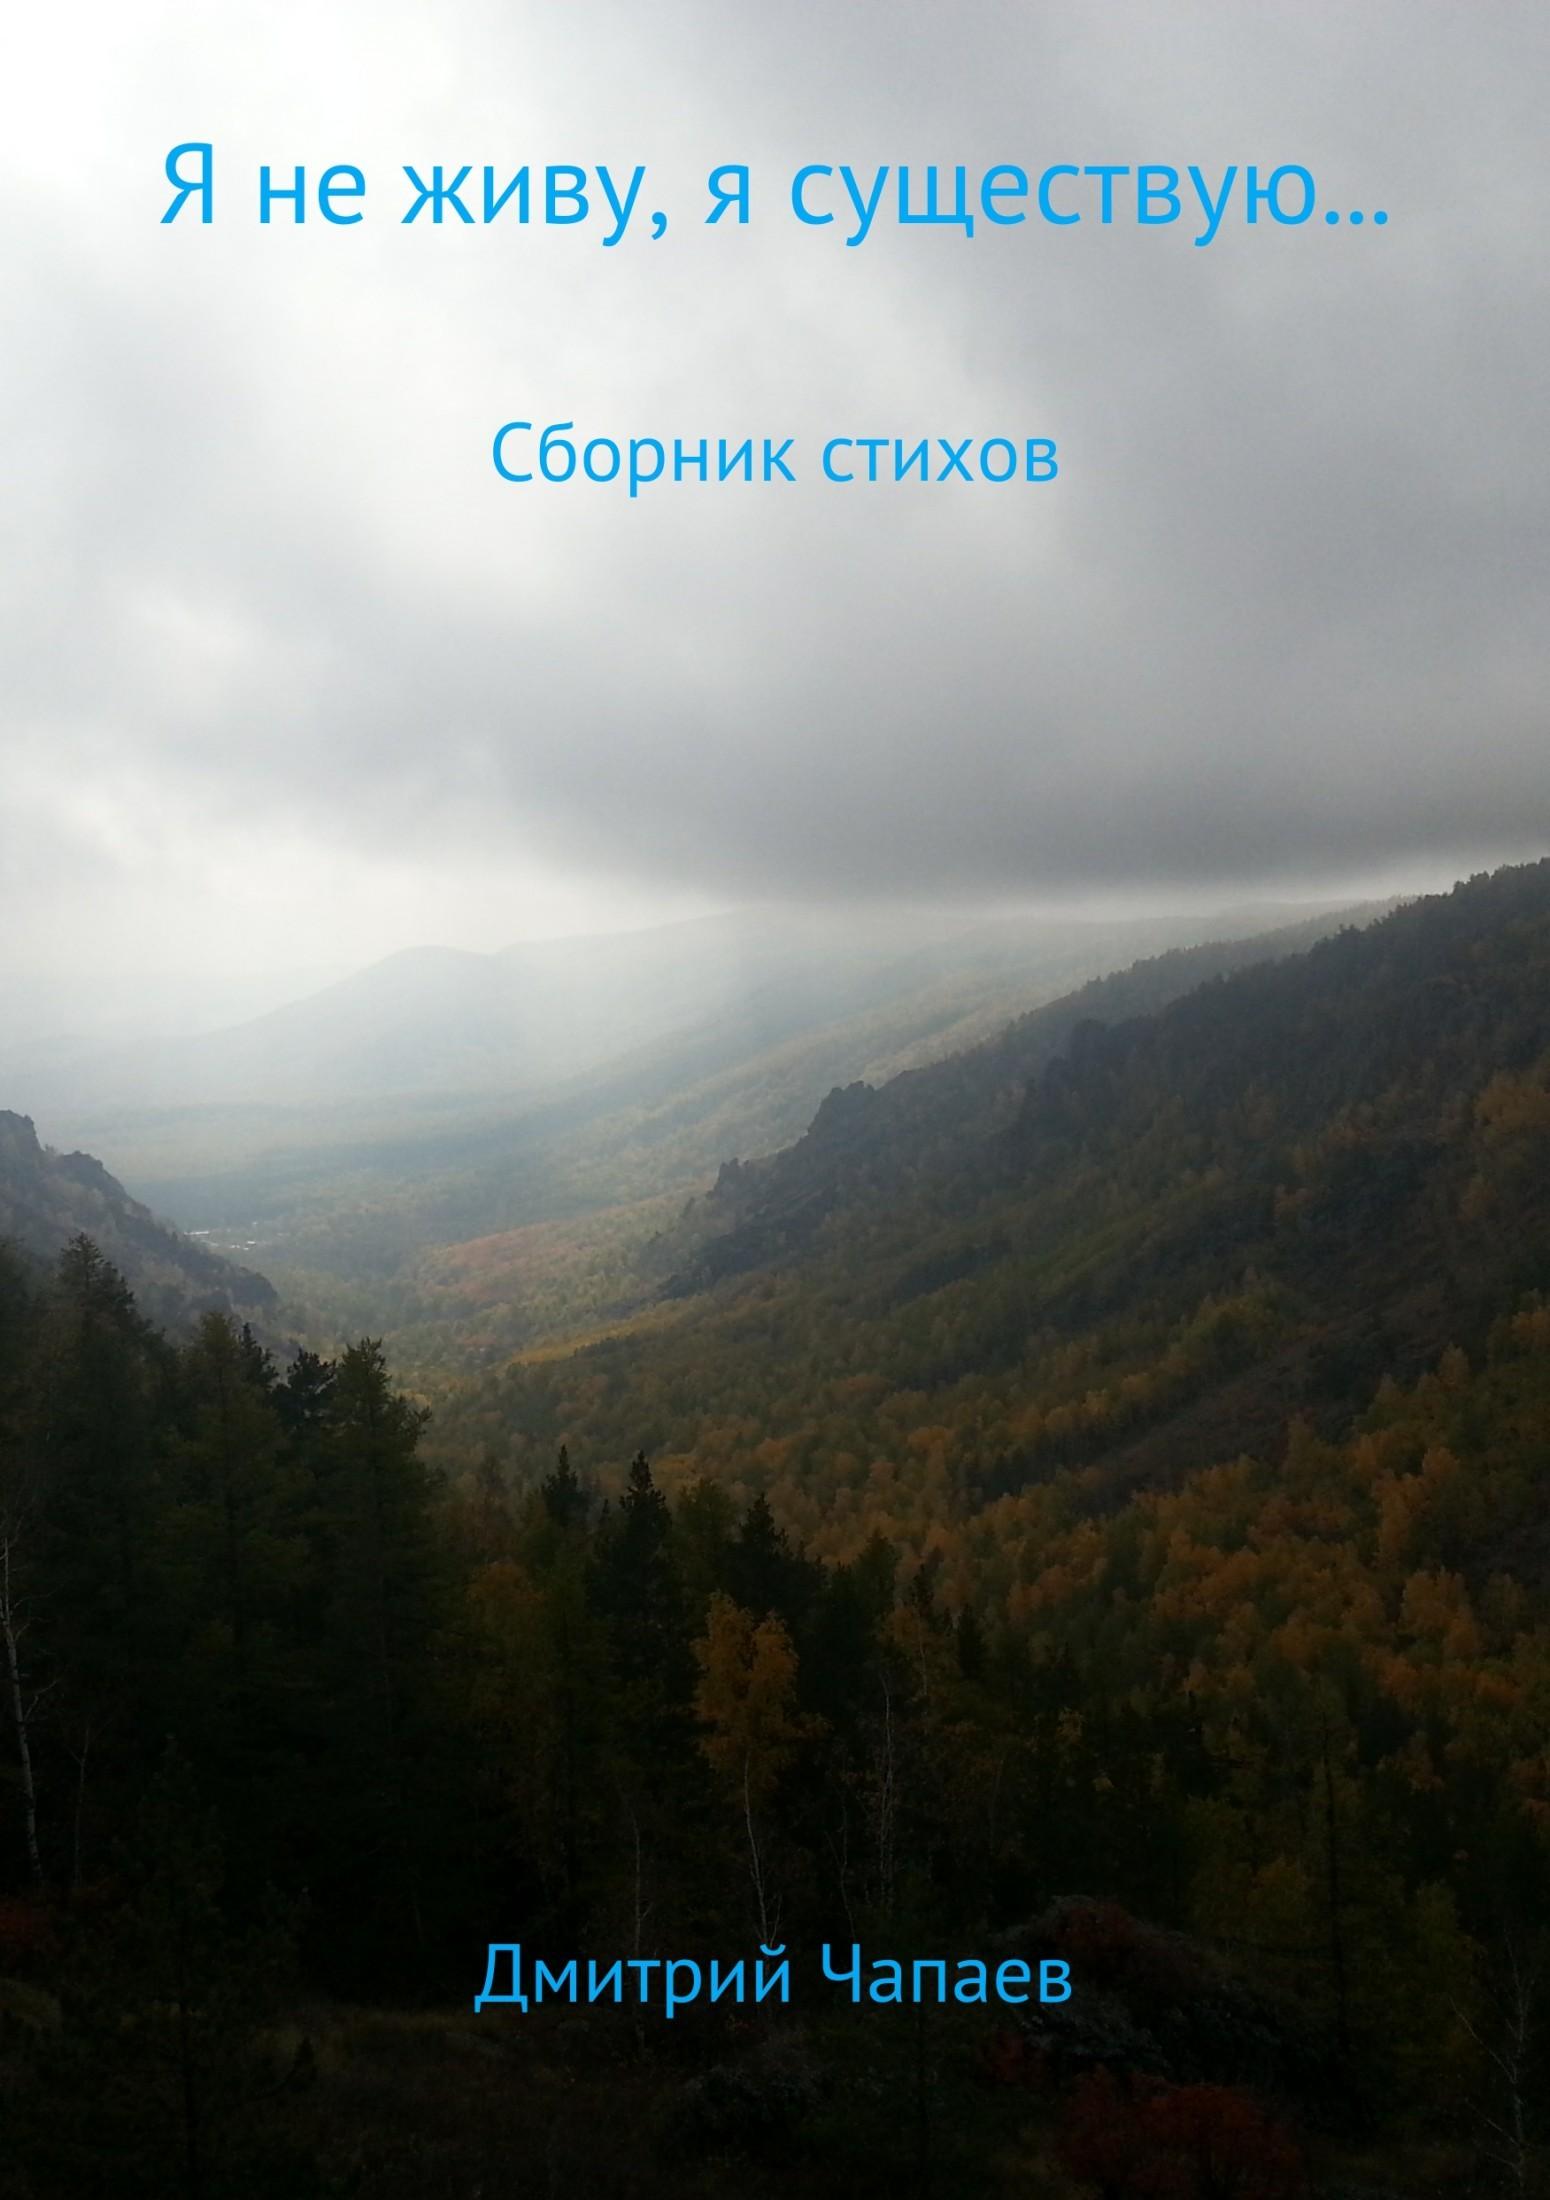 Дмитрий Николаевич Чапаев Я не живу, я существую… Сборник стихотворений фату хива возврат к природе